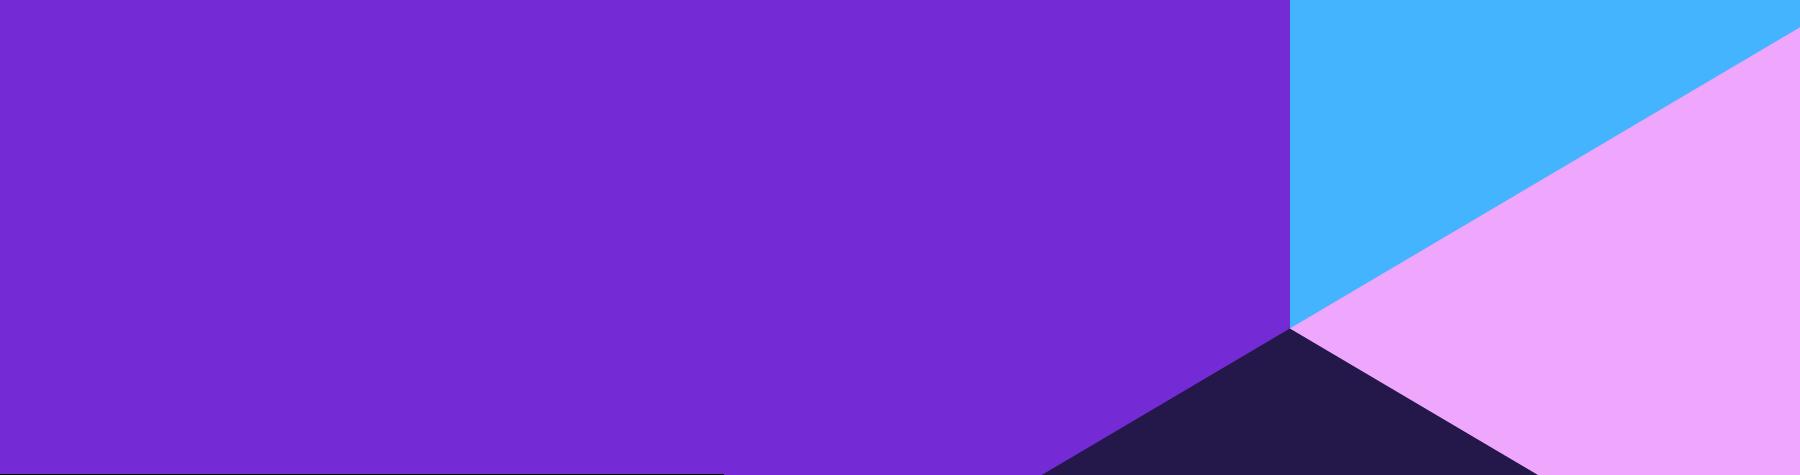 app-integrations-banner